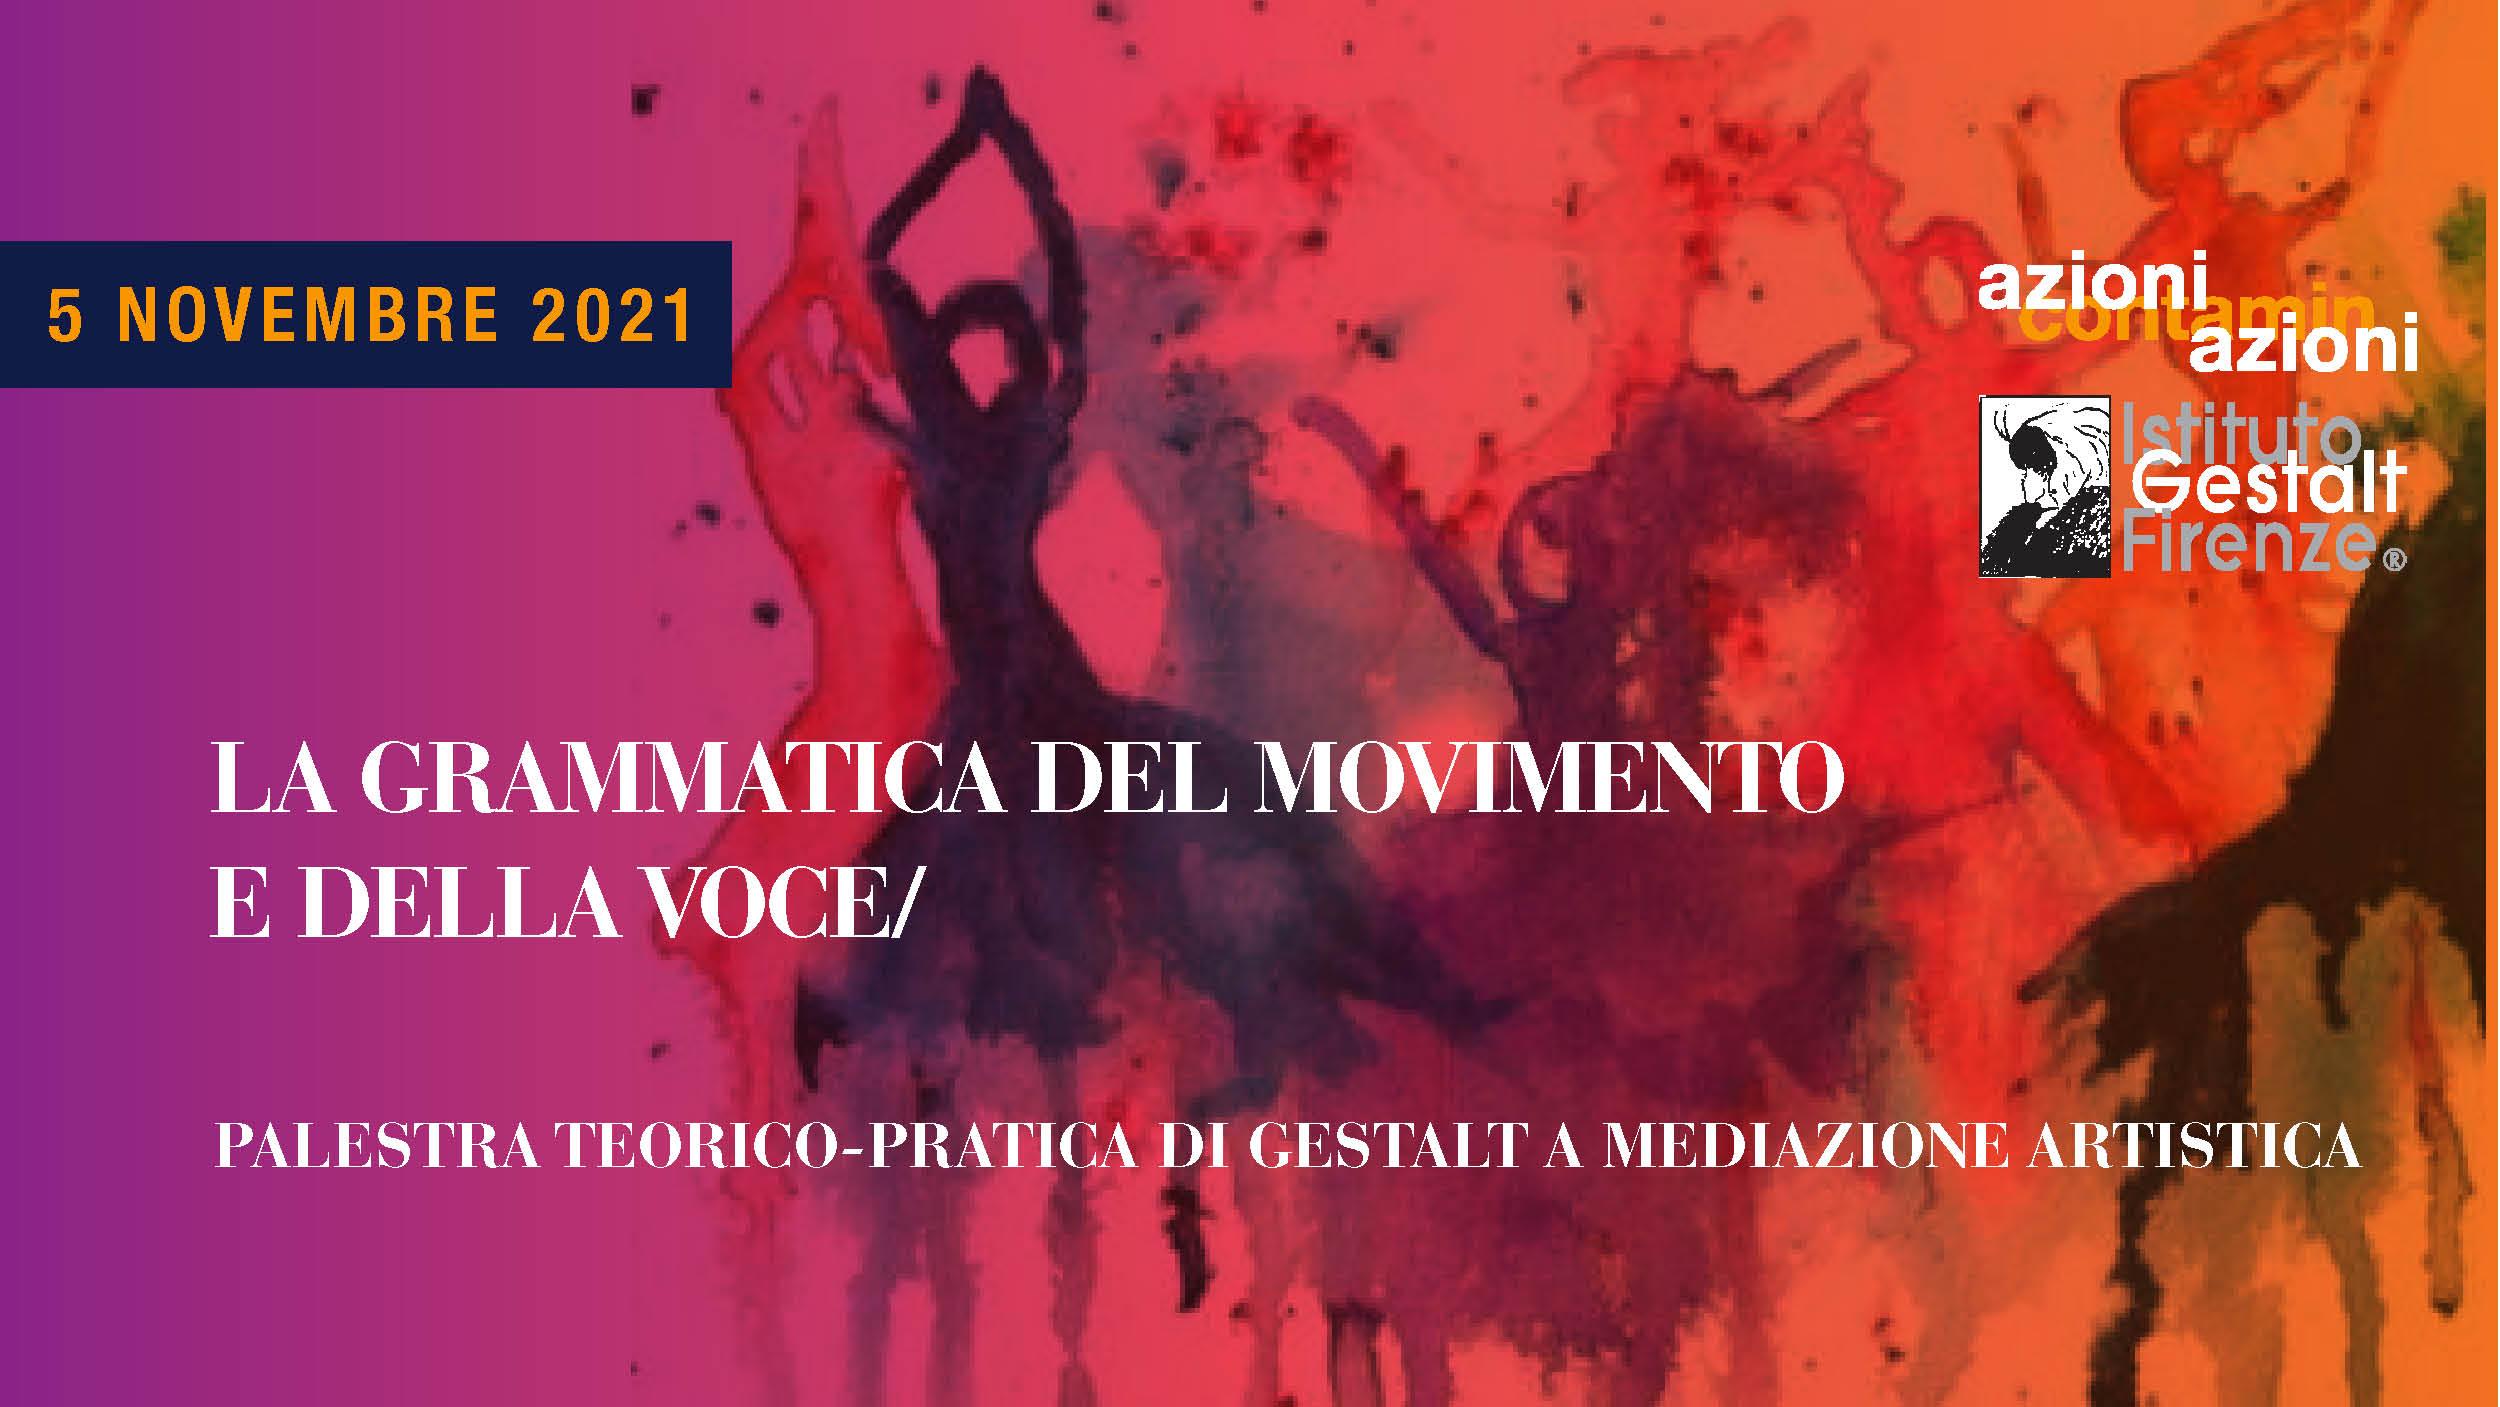 5 nov 2021 - Grammatica Movimento-Voce BANNER